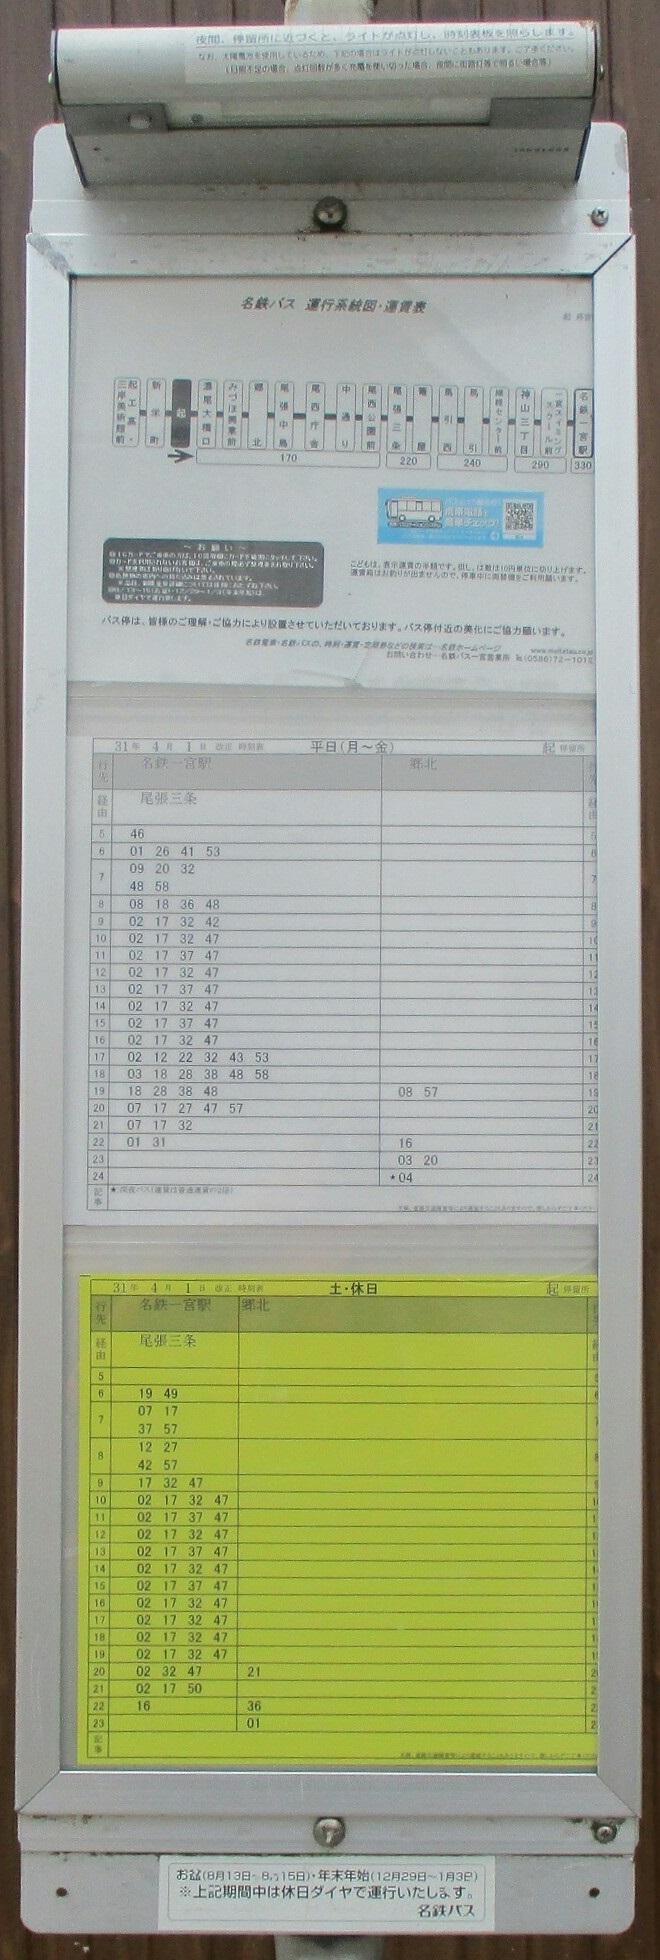 2019.5.27 (39) 起バス停 - 時刻表 660-1960